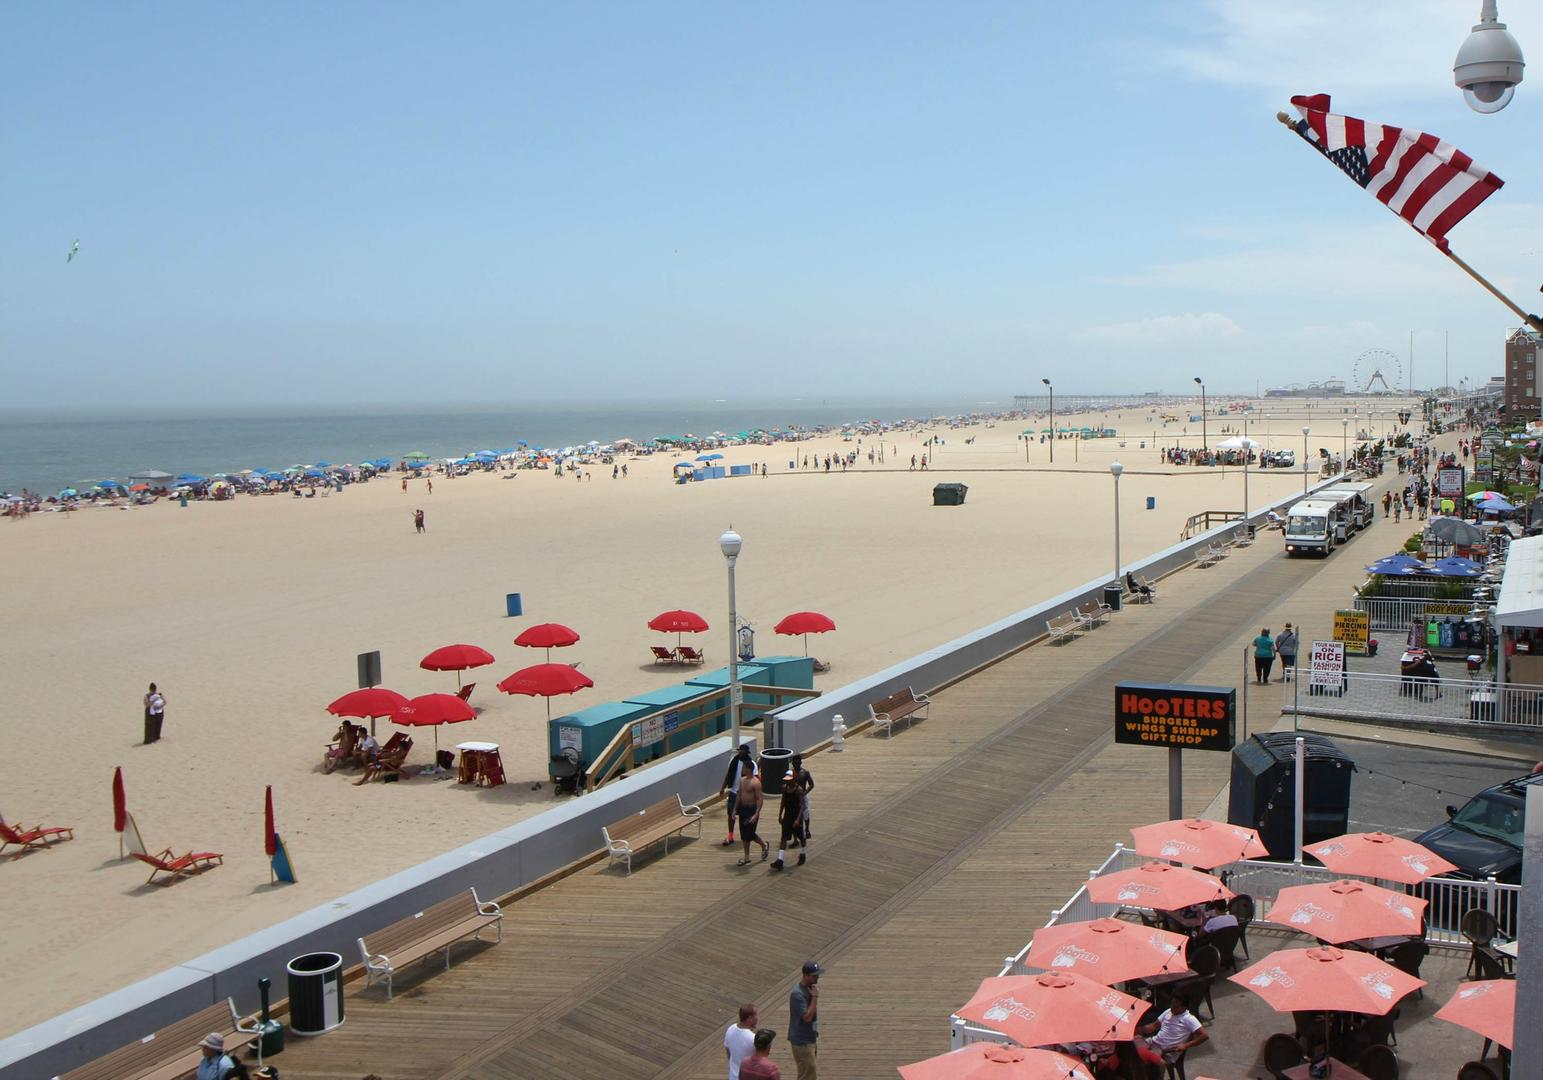 OC Boardwalk Suites - View of Beach and Boardwalk